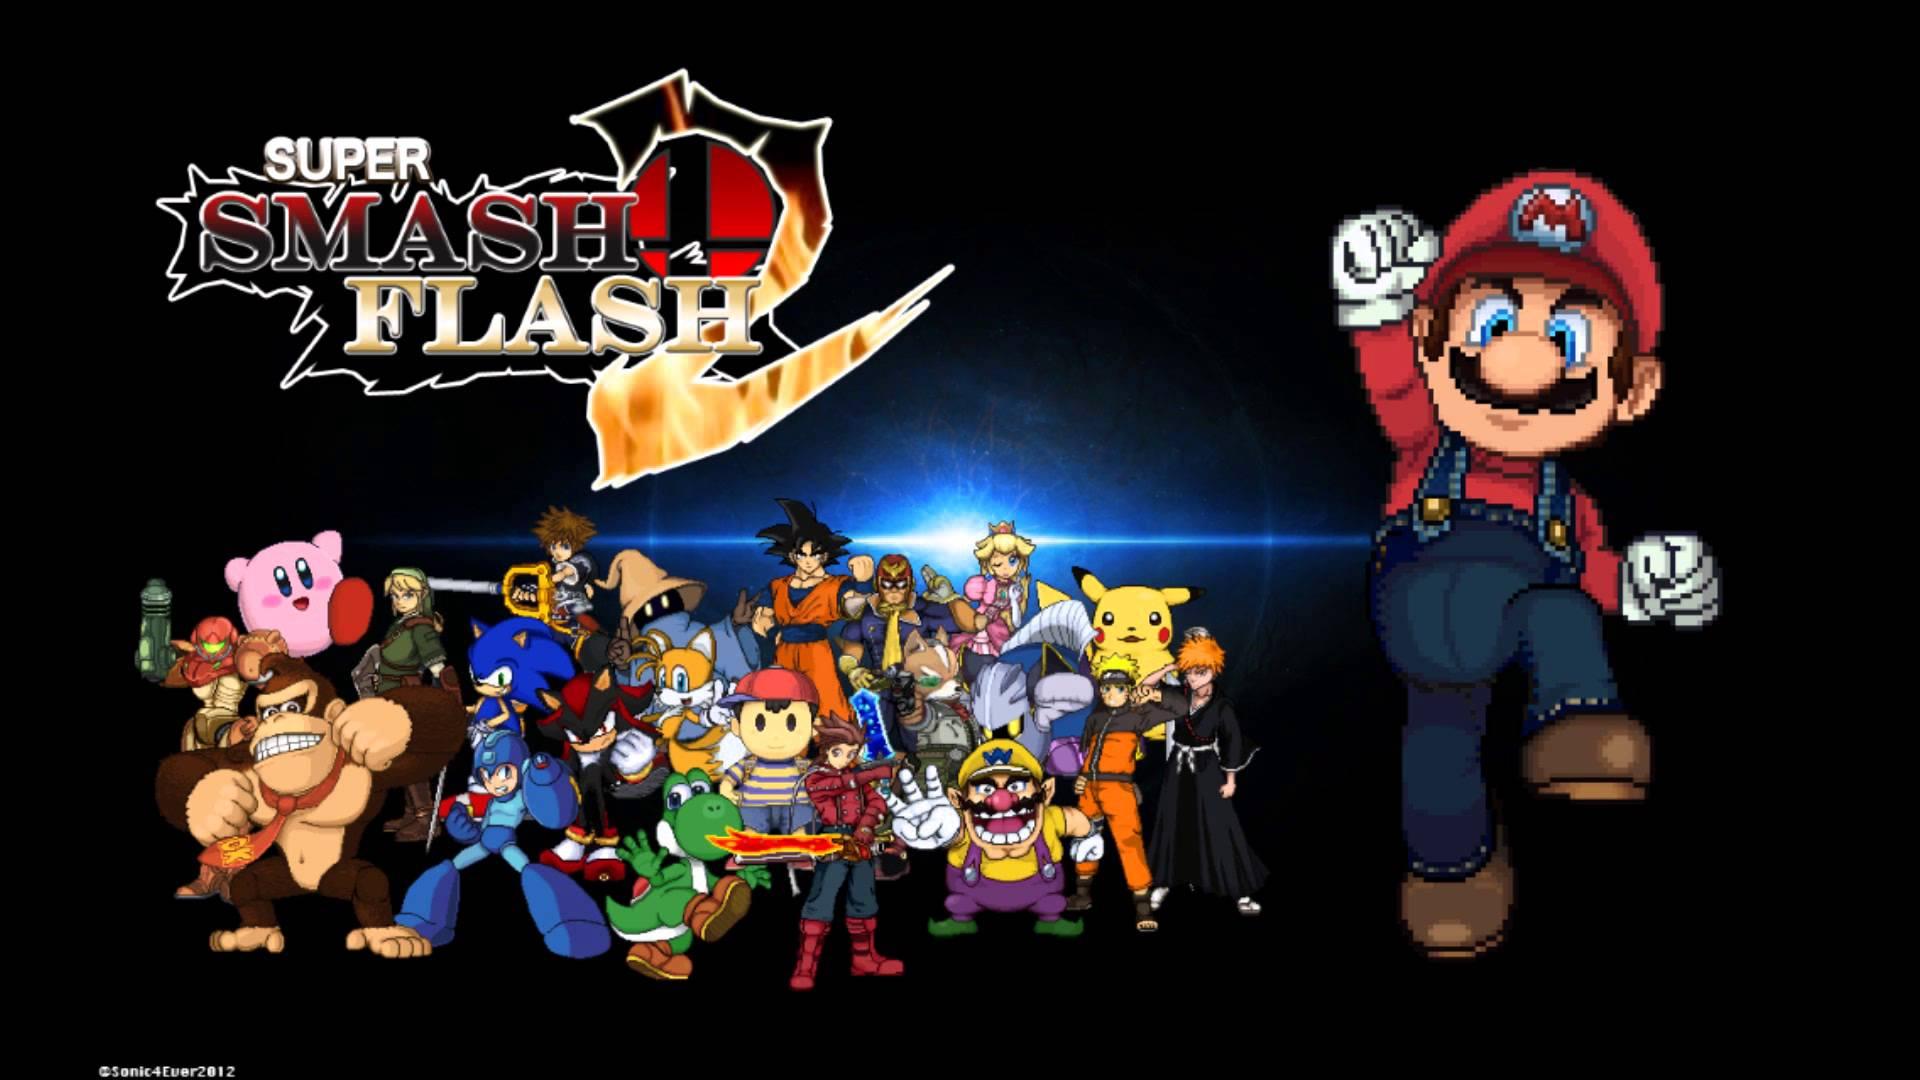 Super Smash Flash 2 Game Wallpapers Wallpaper Cave